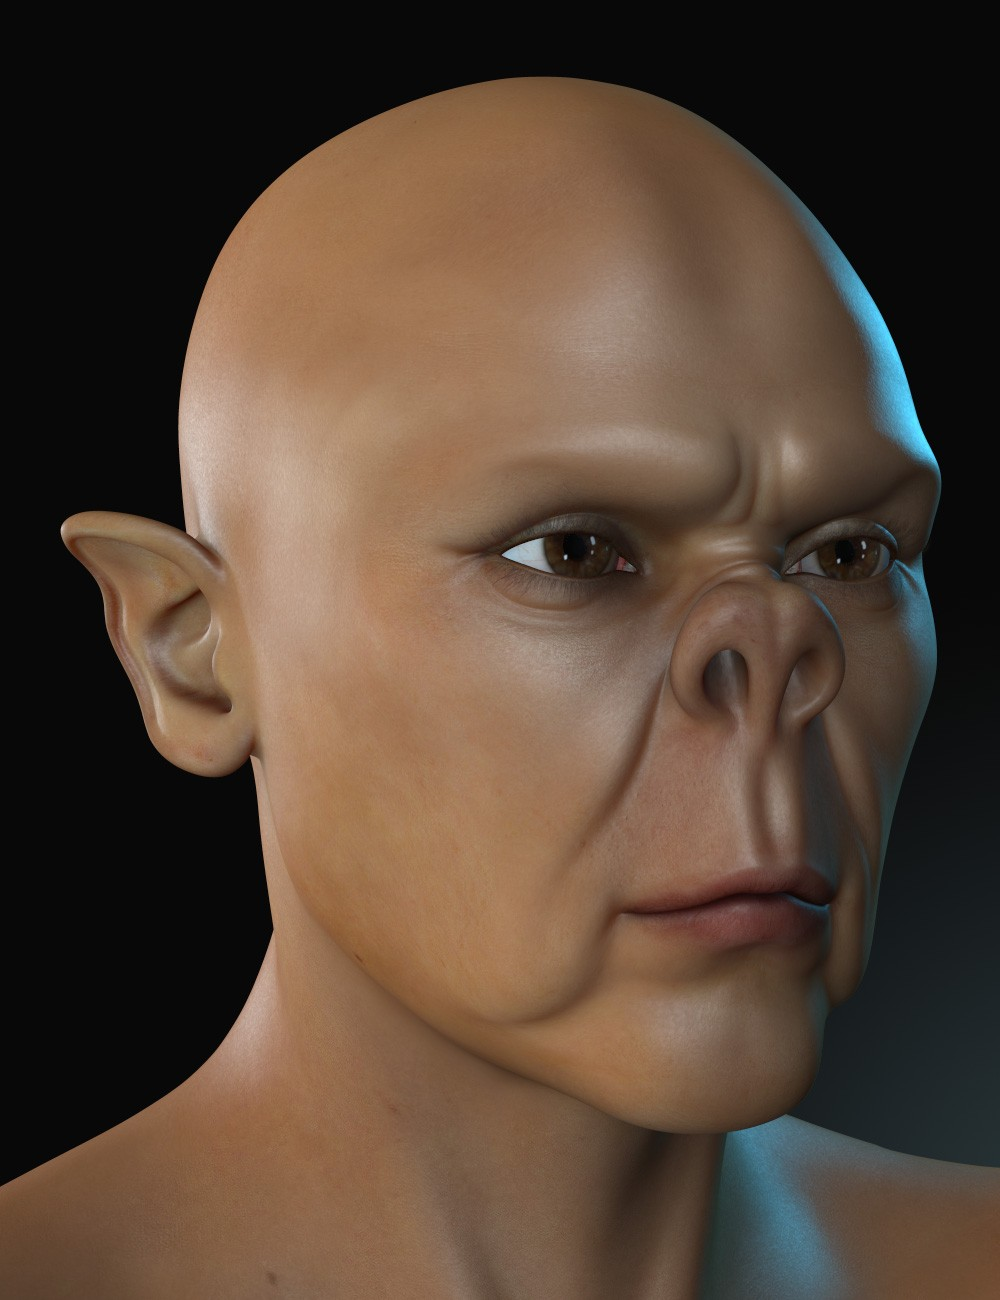 Pug Face Morph